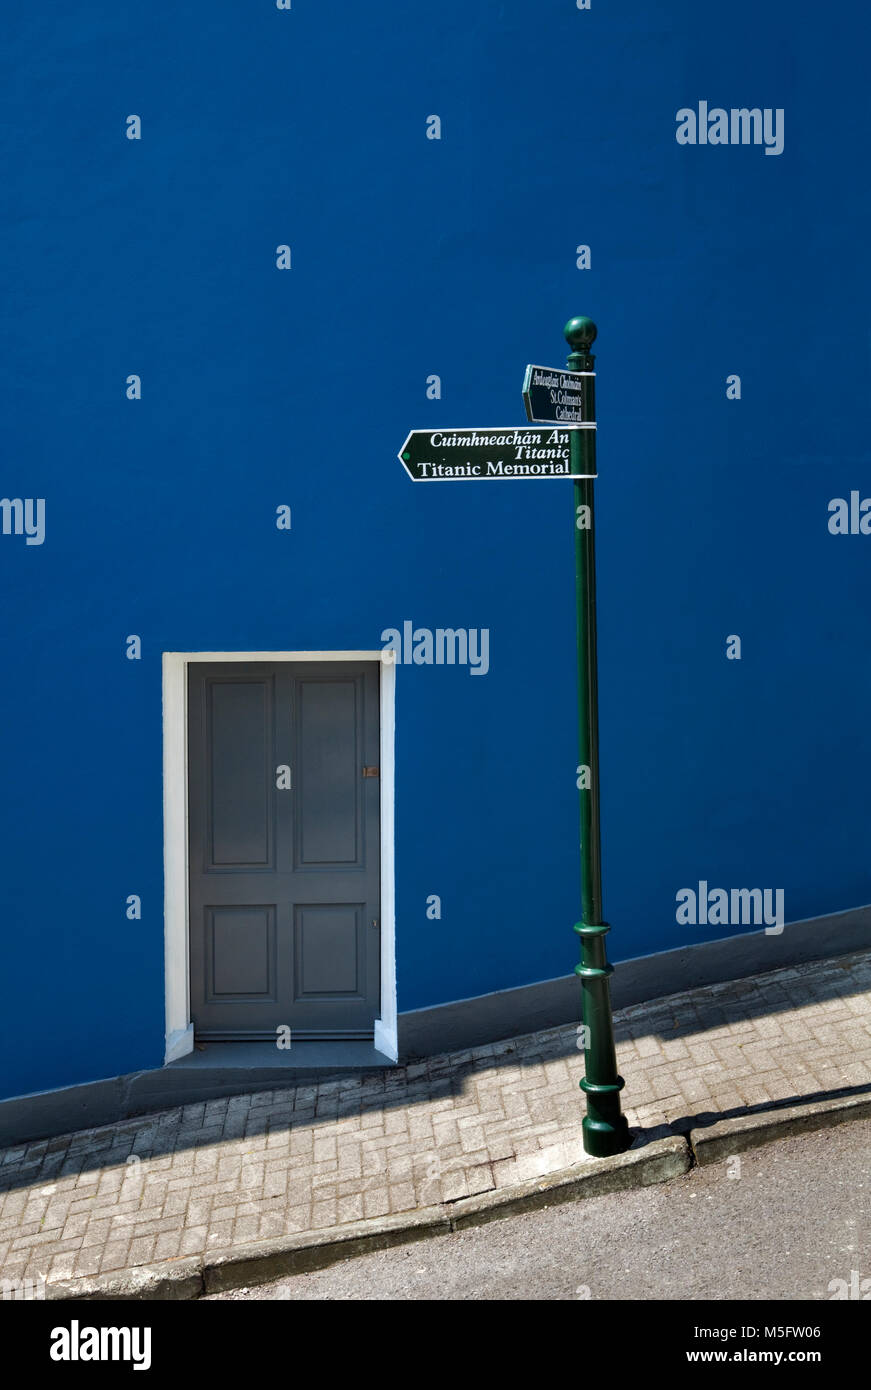 Signpost to the Titanic Memorial, Cobh, County Cork, Ireland - Stock Image